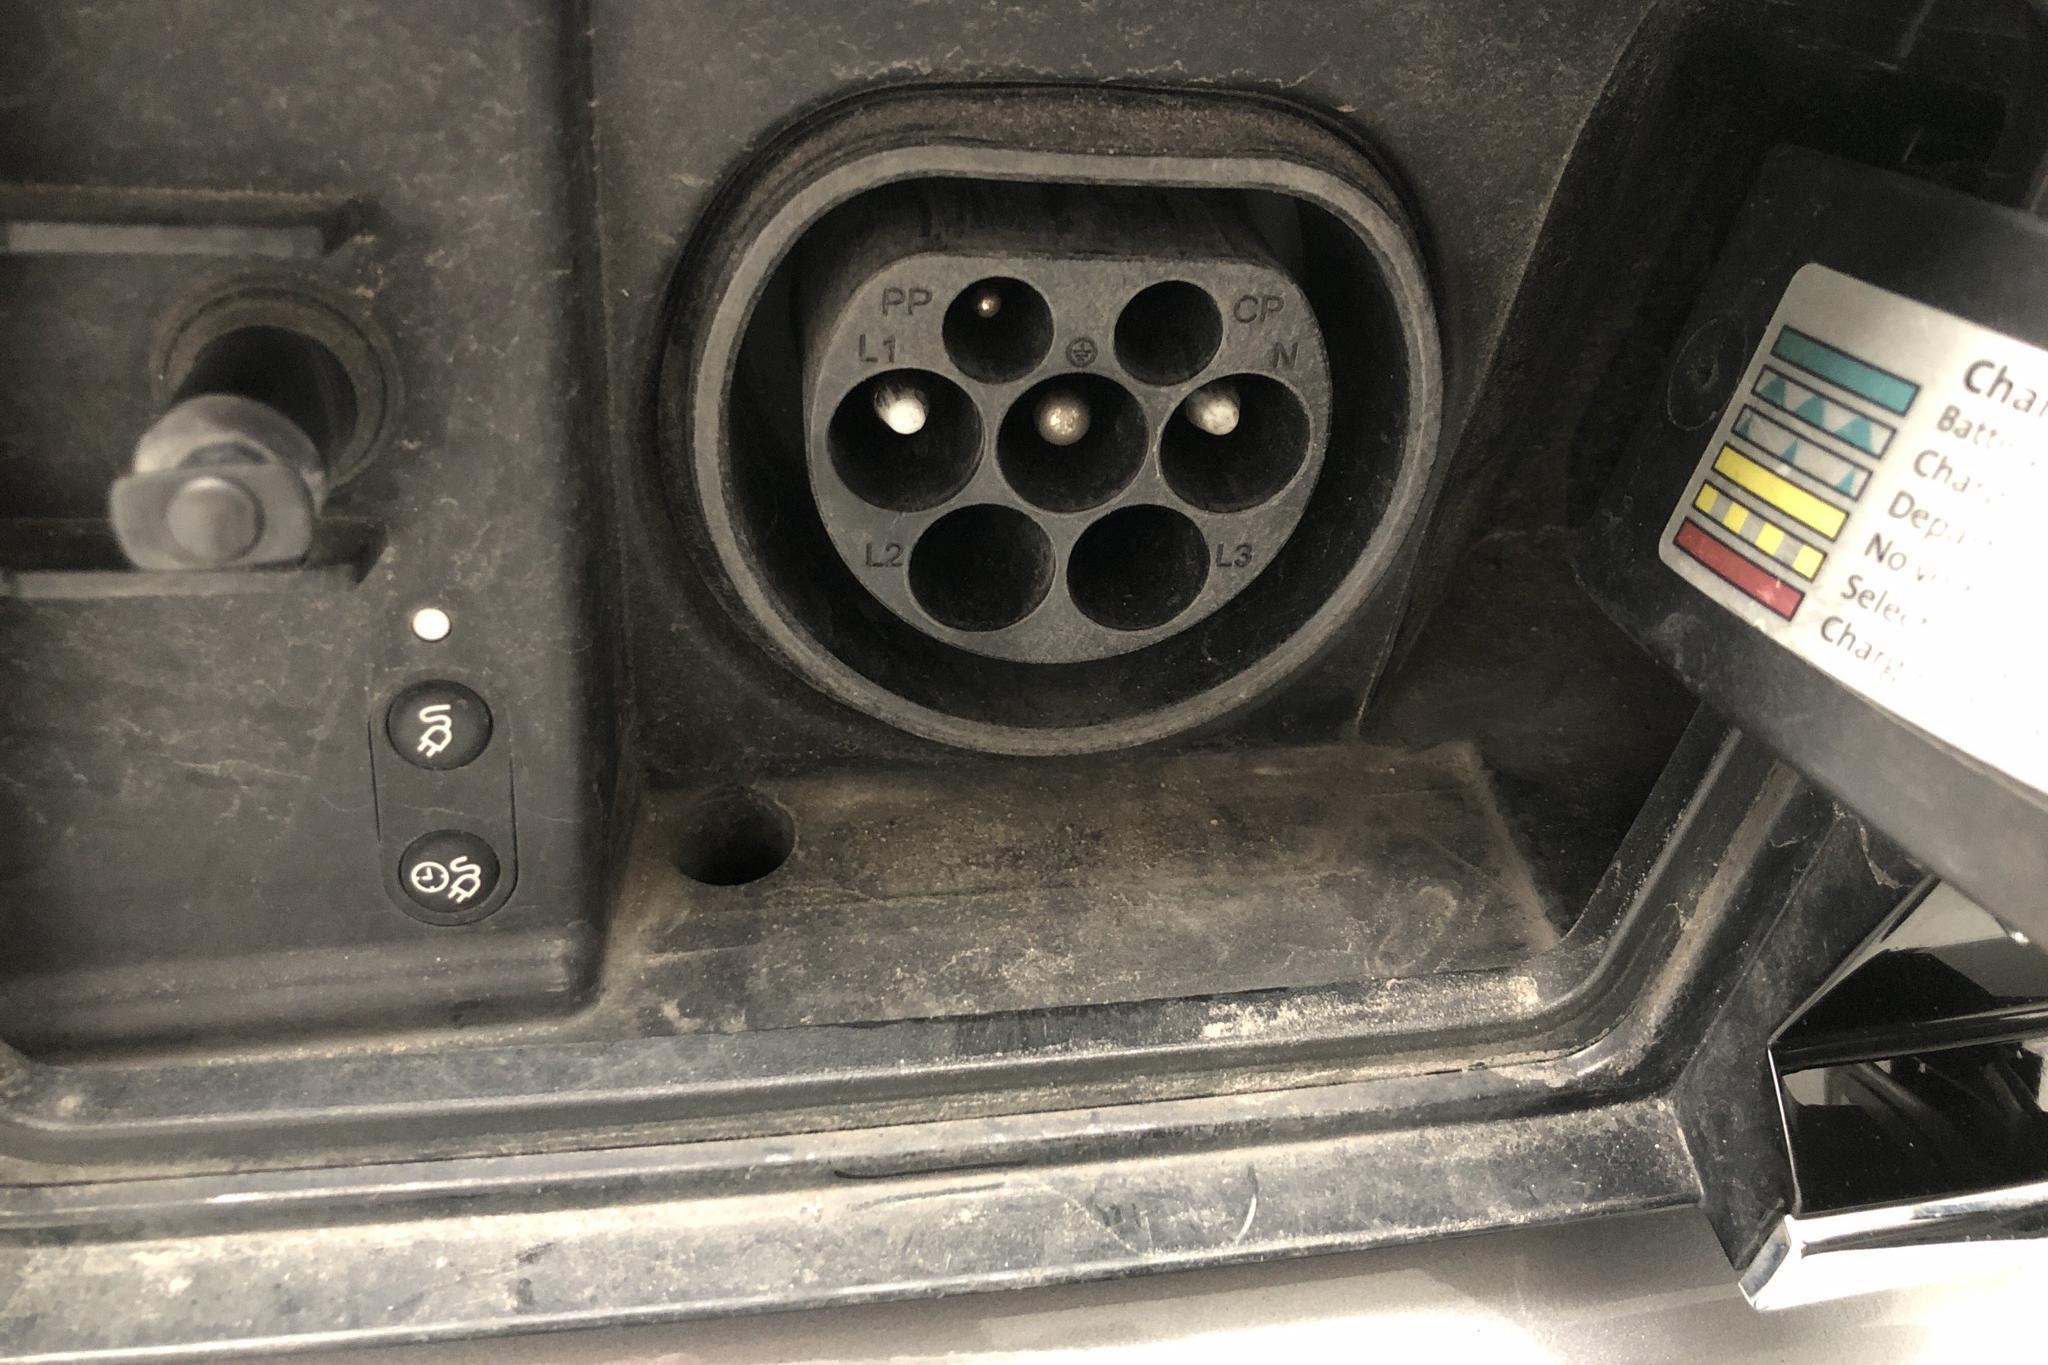 VW Passat 1.4 Plug-in-Hybrid Sportscombi (218hk) - 6 465 mil - Automat - silver - 2018